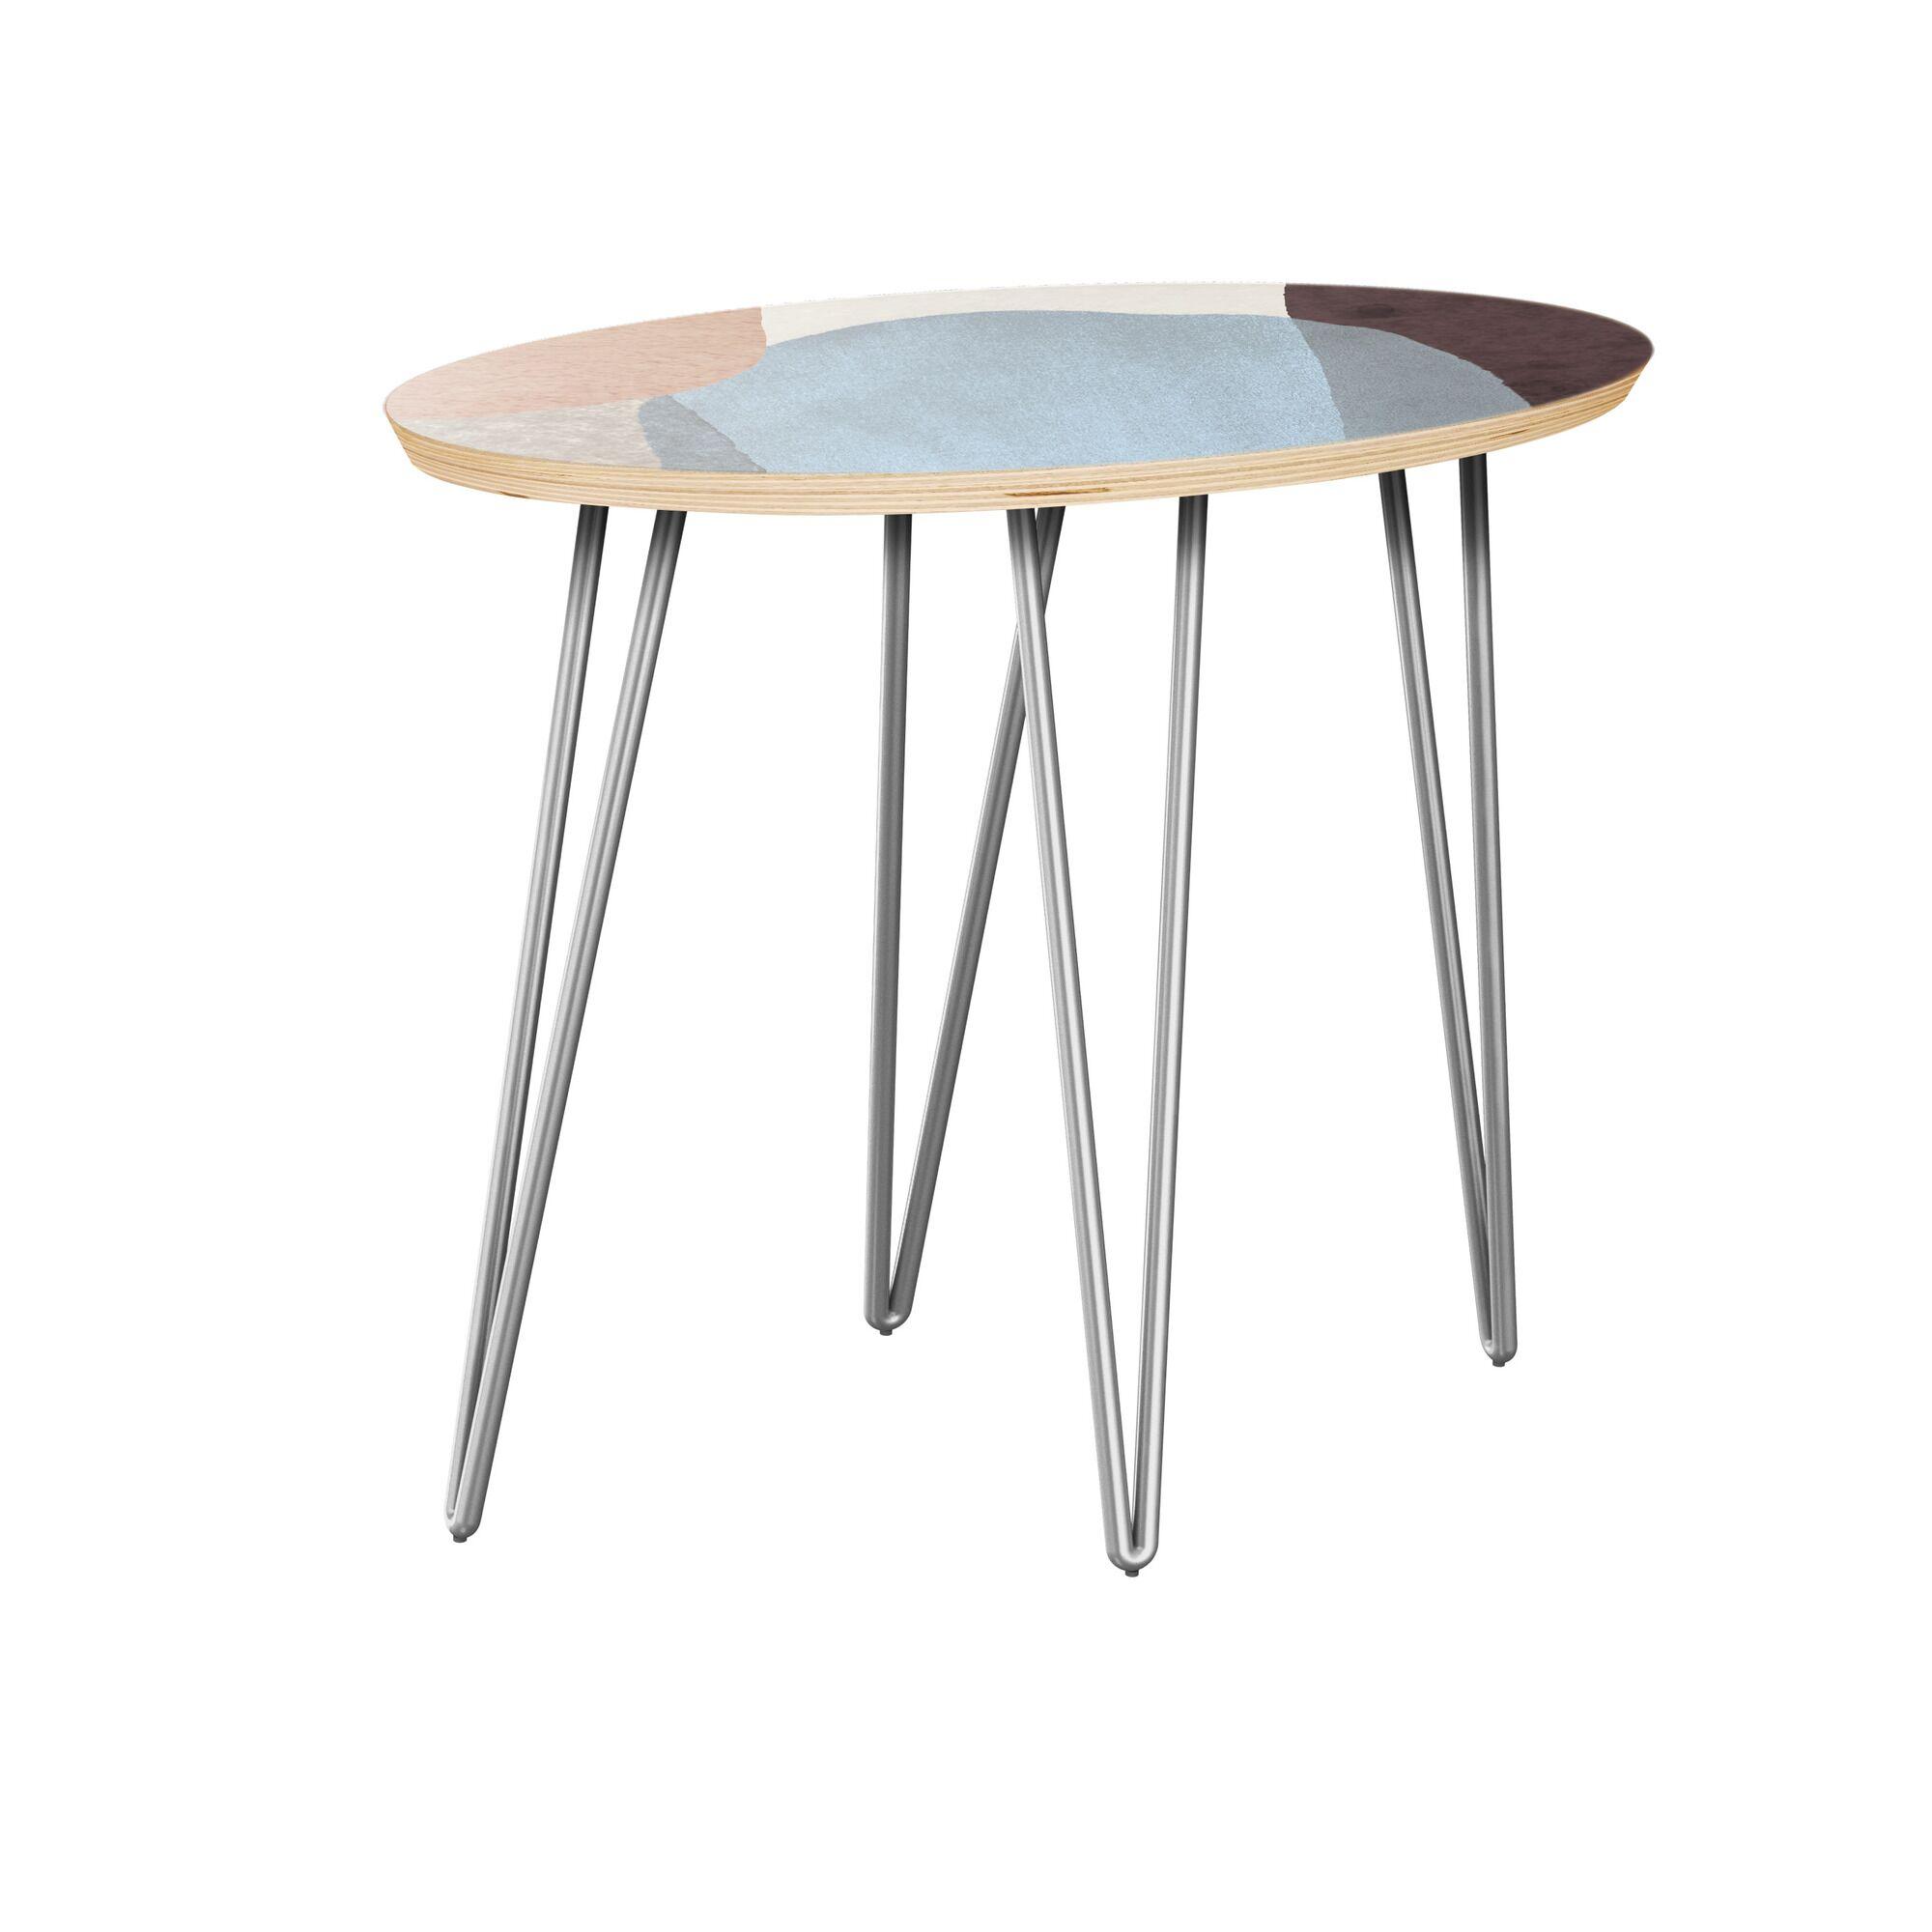 Kalyssa End Table Table Top Color: Natural, Table Base Color: Chrome